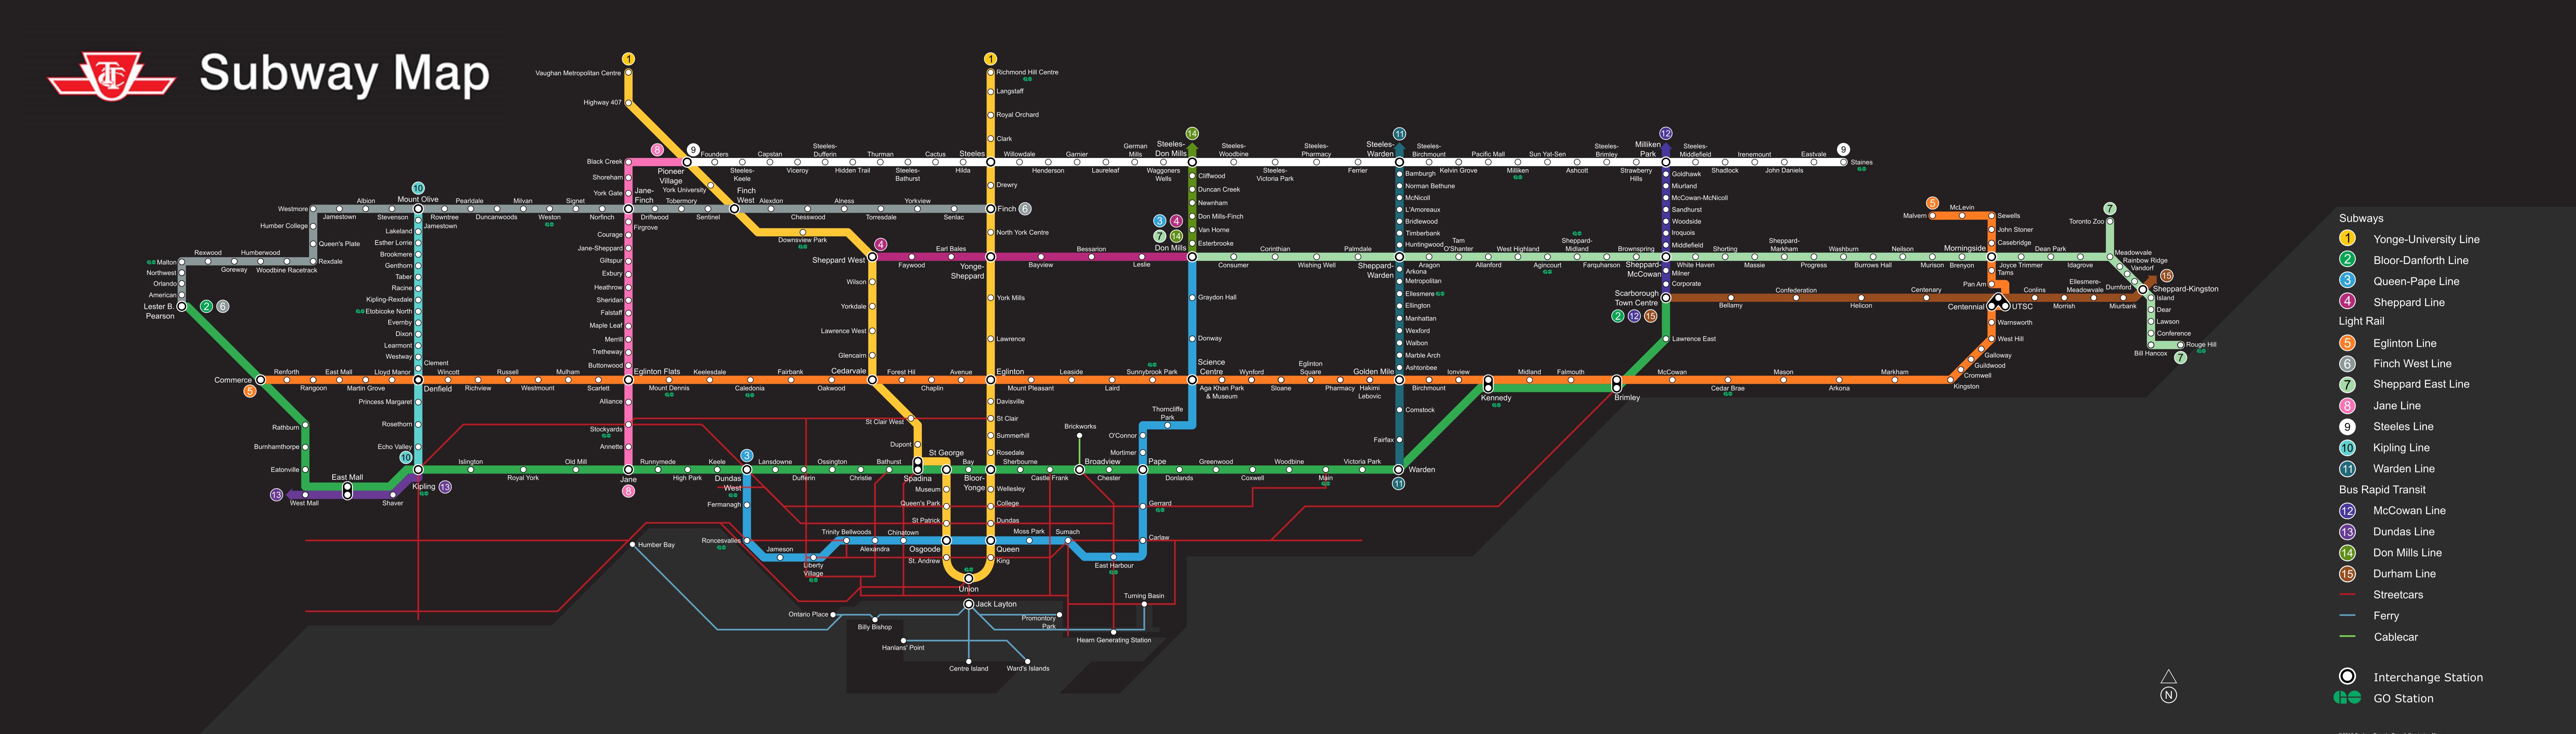 Toronto Dream Subway Map.This Ttc Fantasy Map Is Every Toronto Commuter S Dream Urbanized